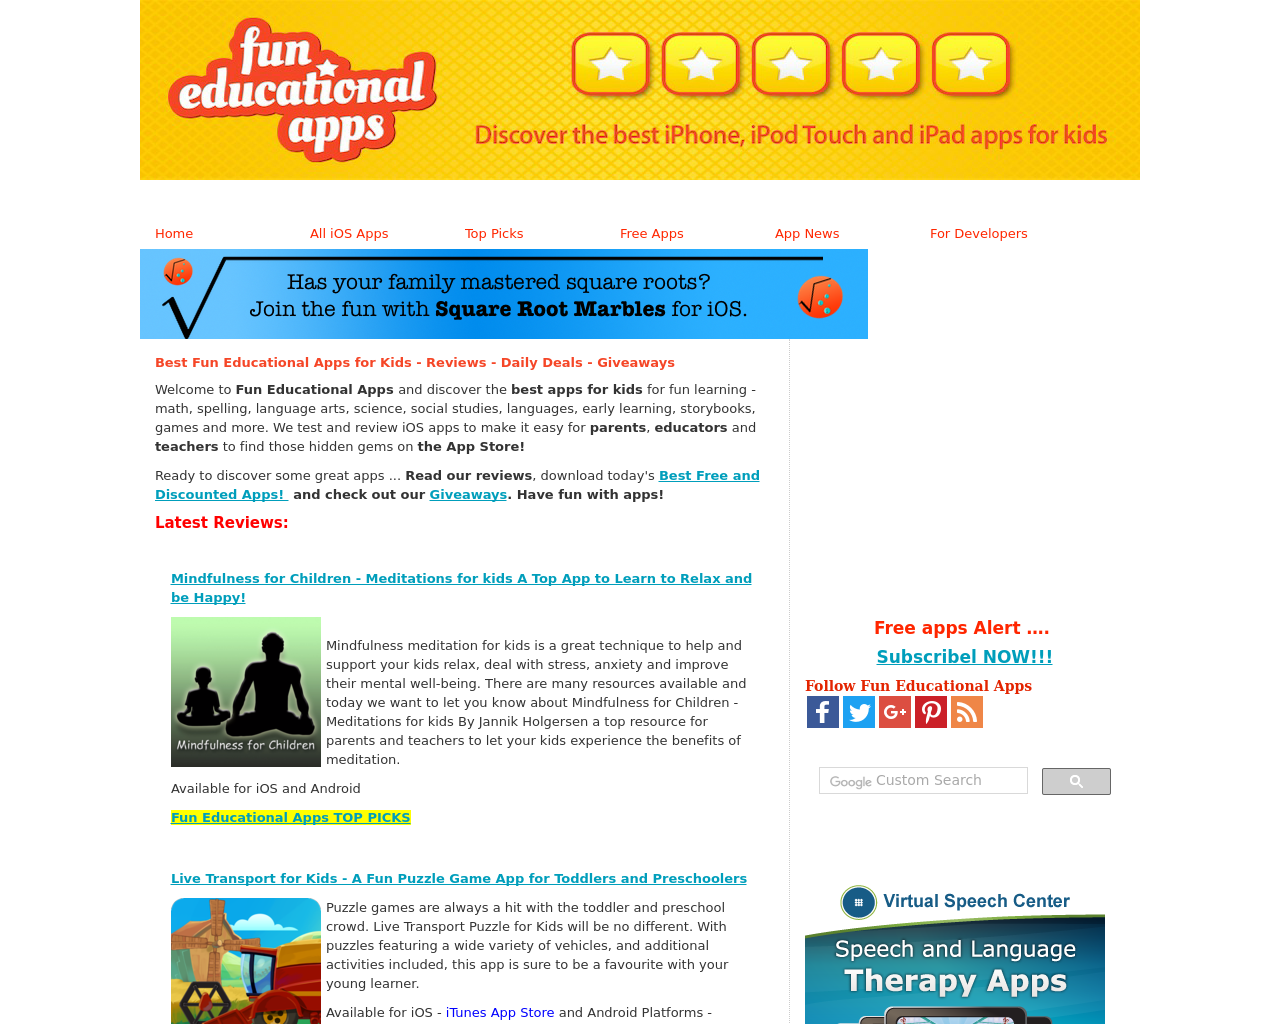 Fun-Educational-Apps-Advertising-Reviews-Pricing